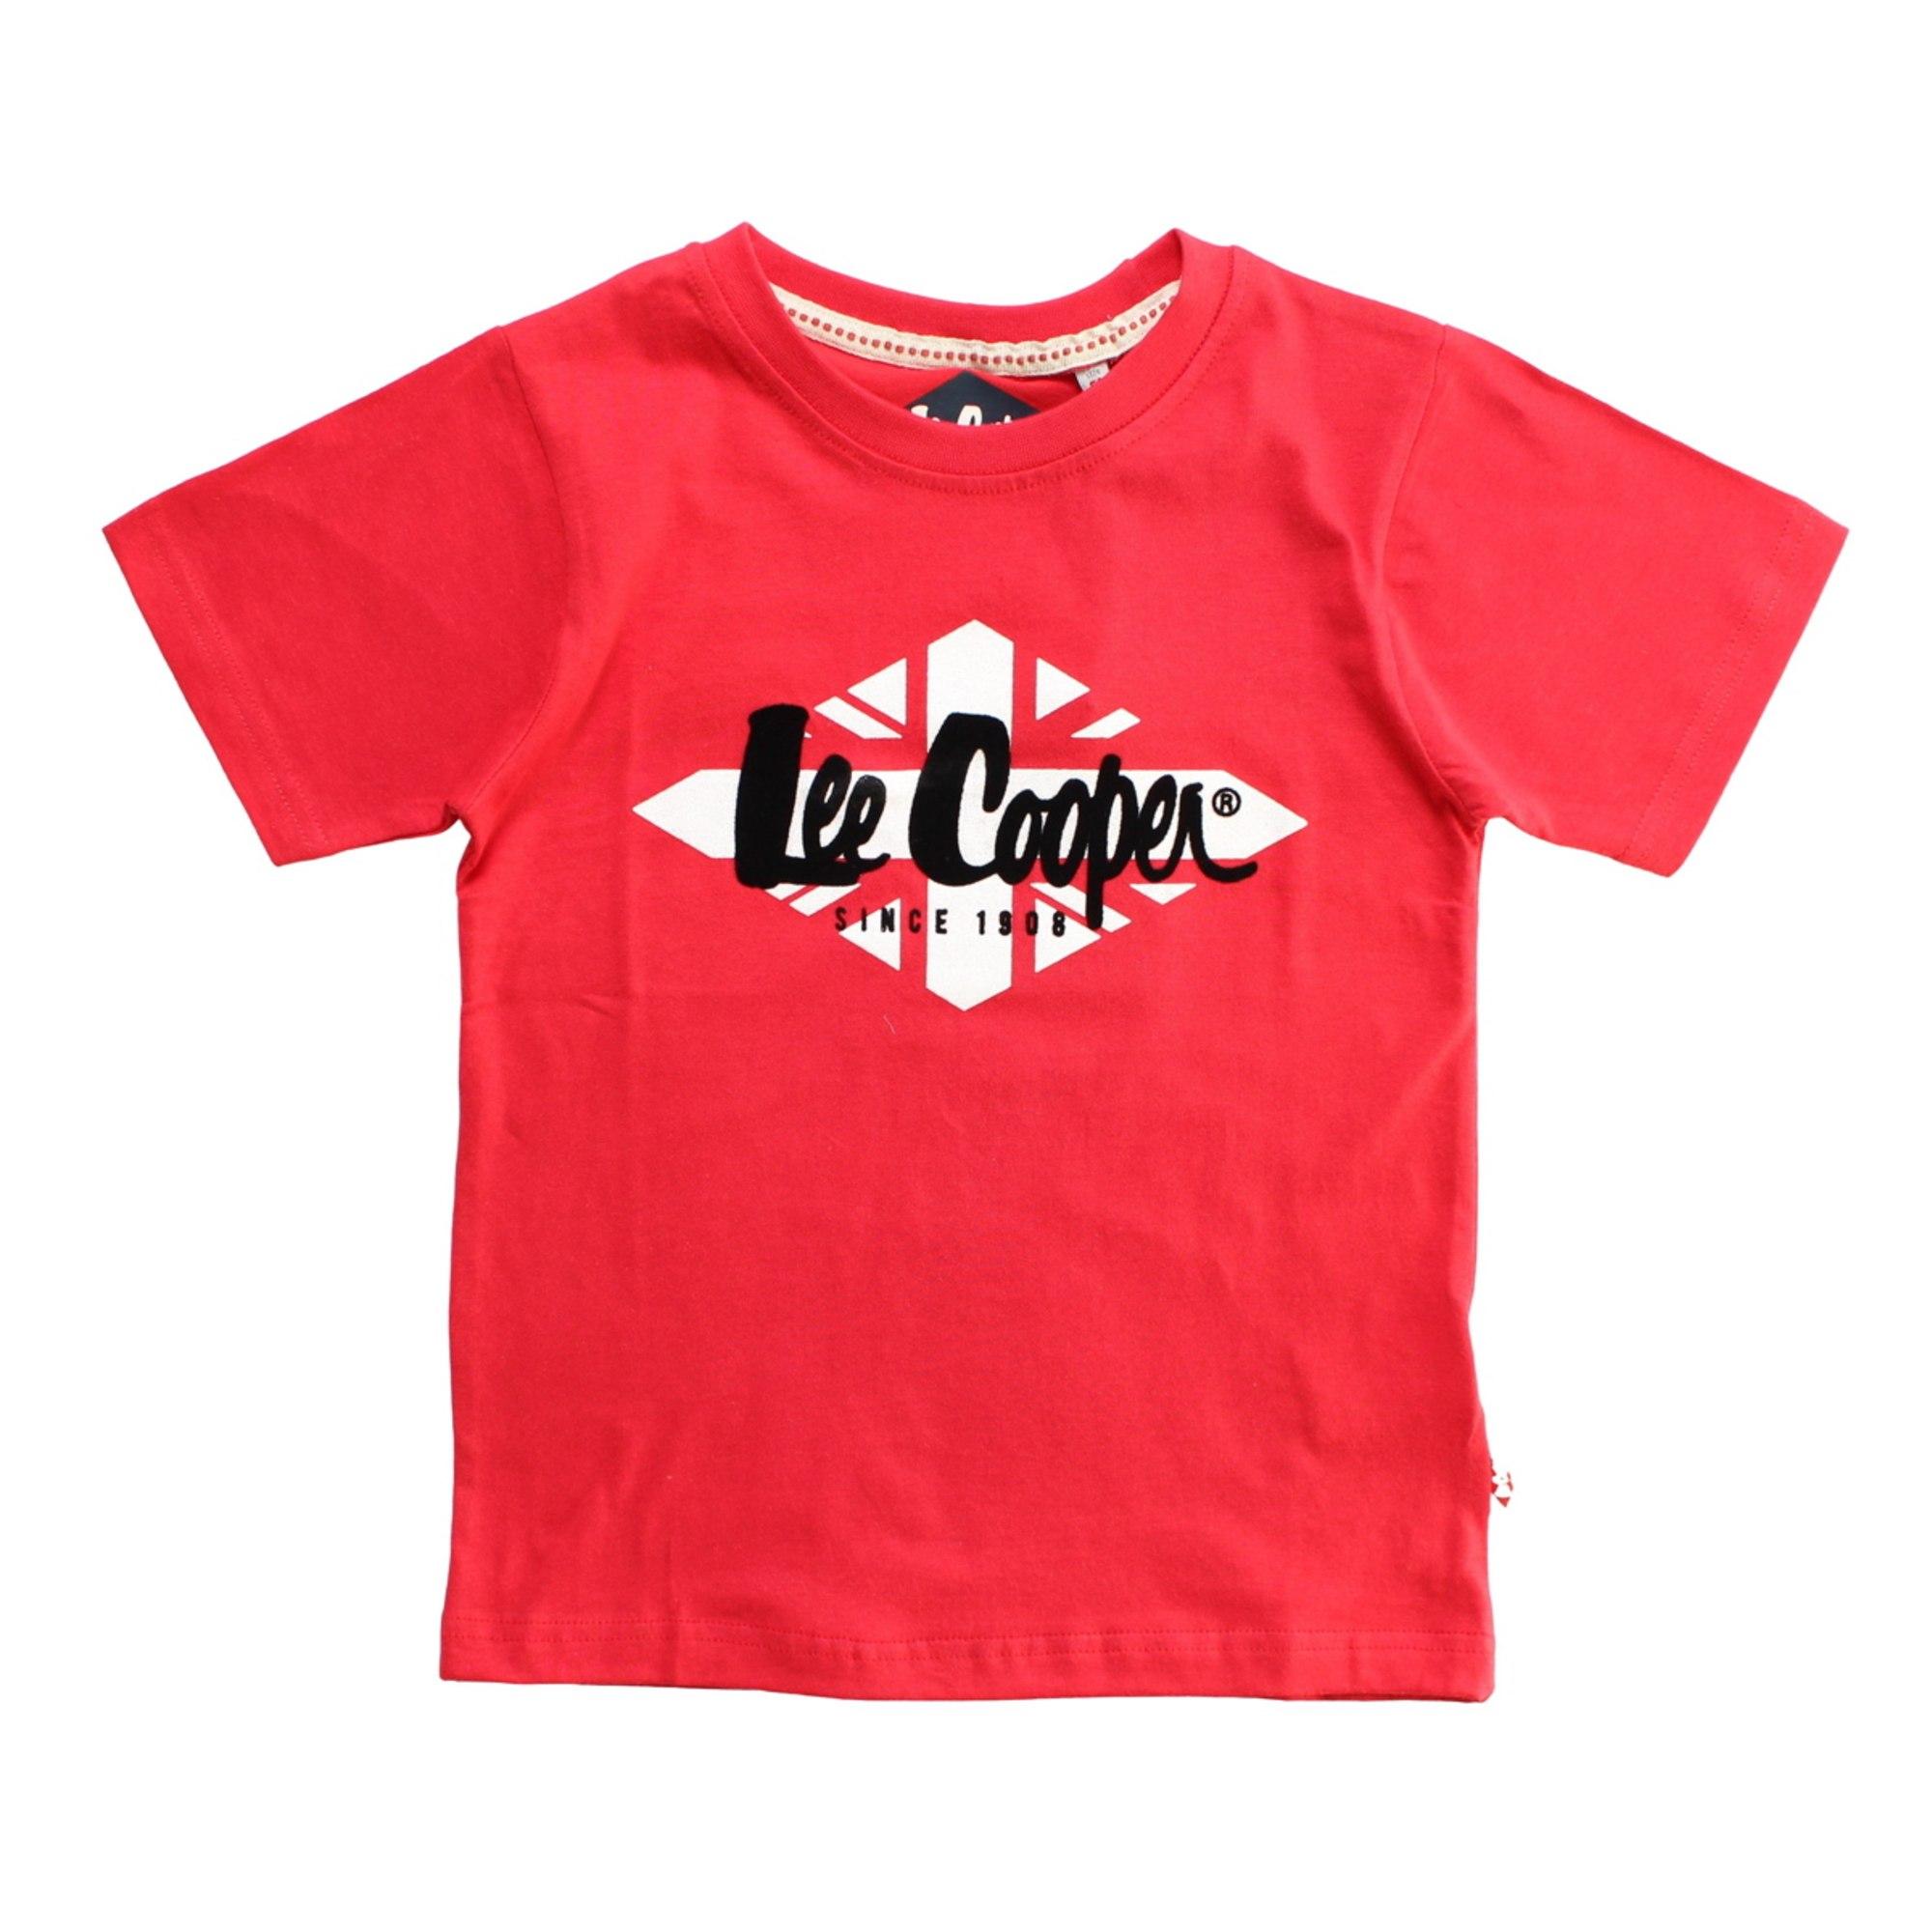 Tee-shirt LEE COOPER Rouge, bordeaux